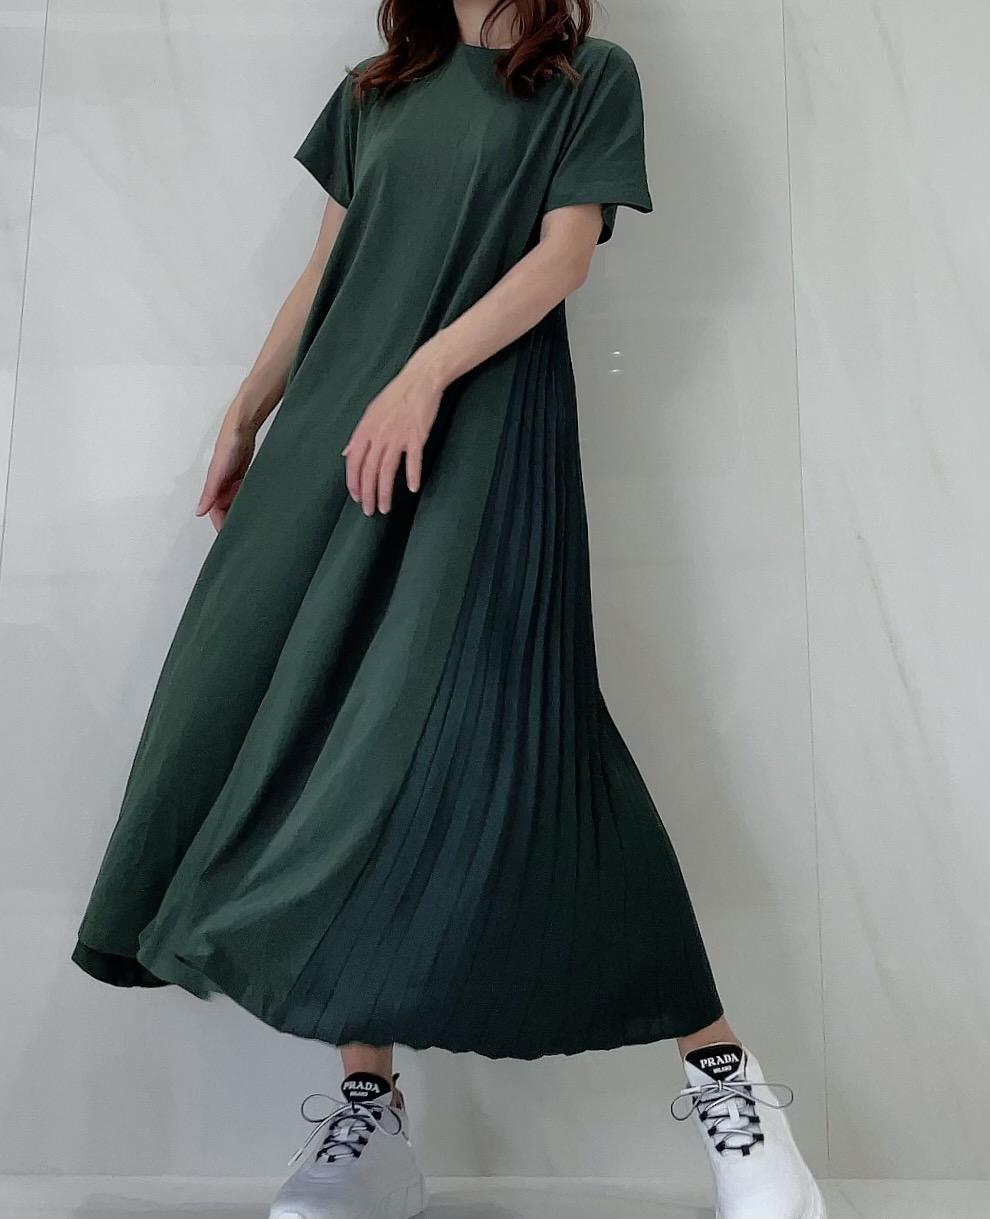 【selva secreta】Pleats Tshirt one-piece(green)